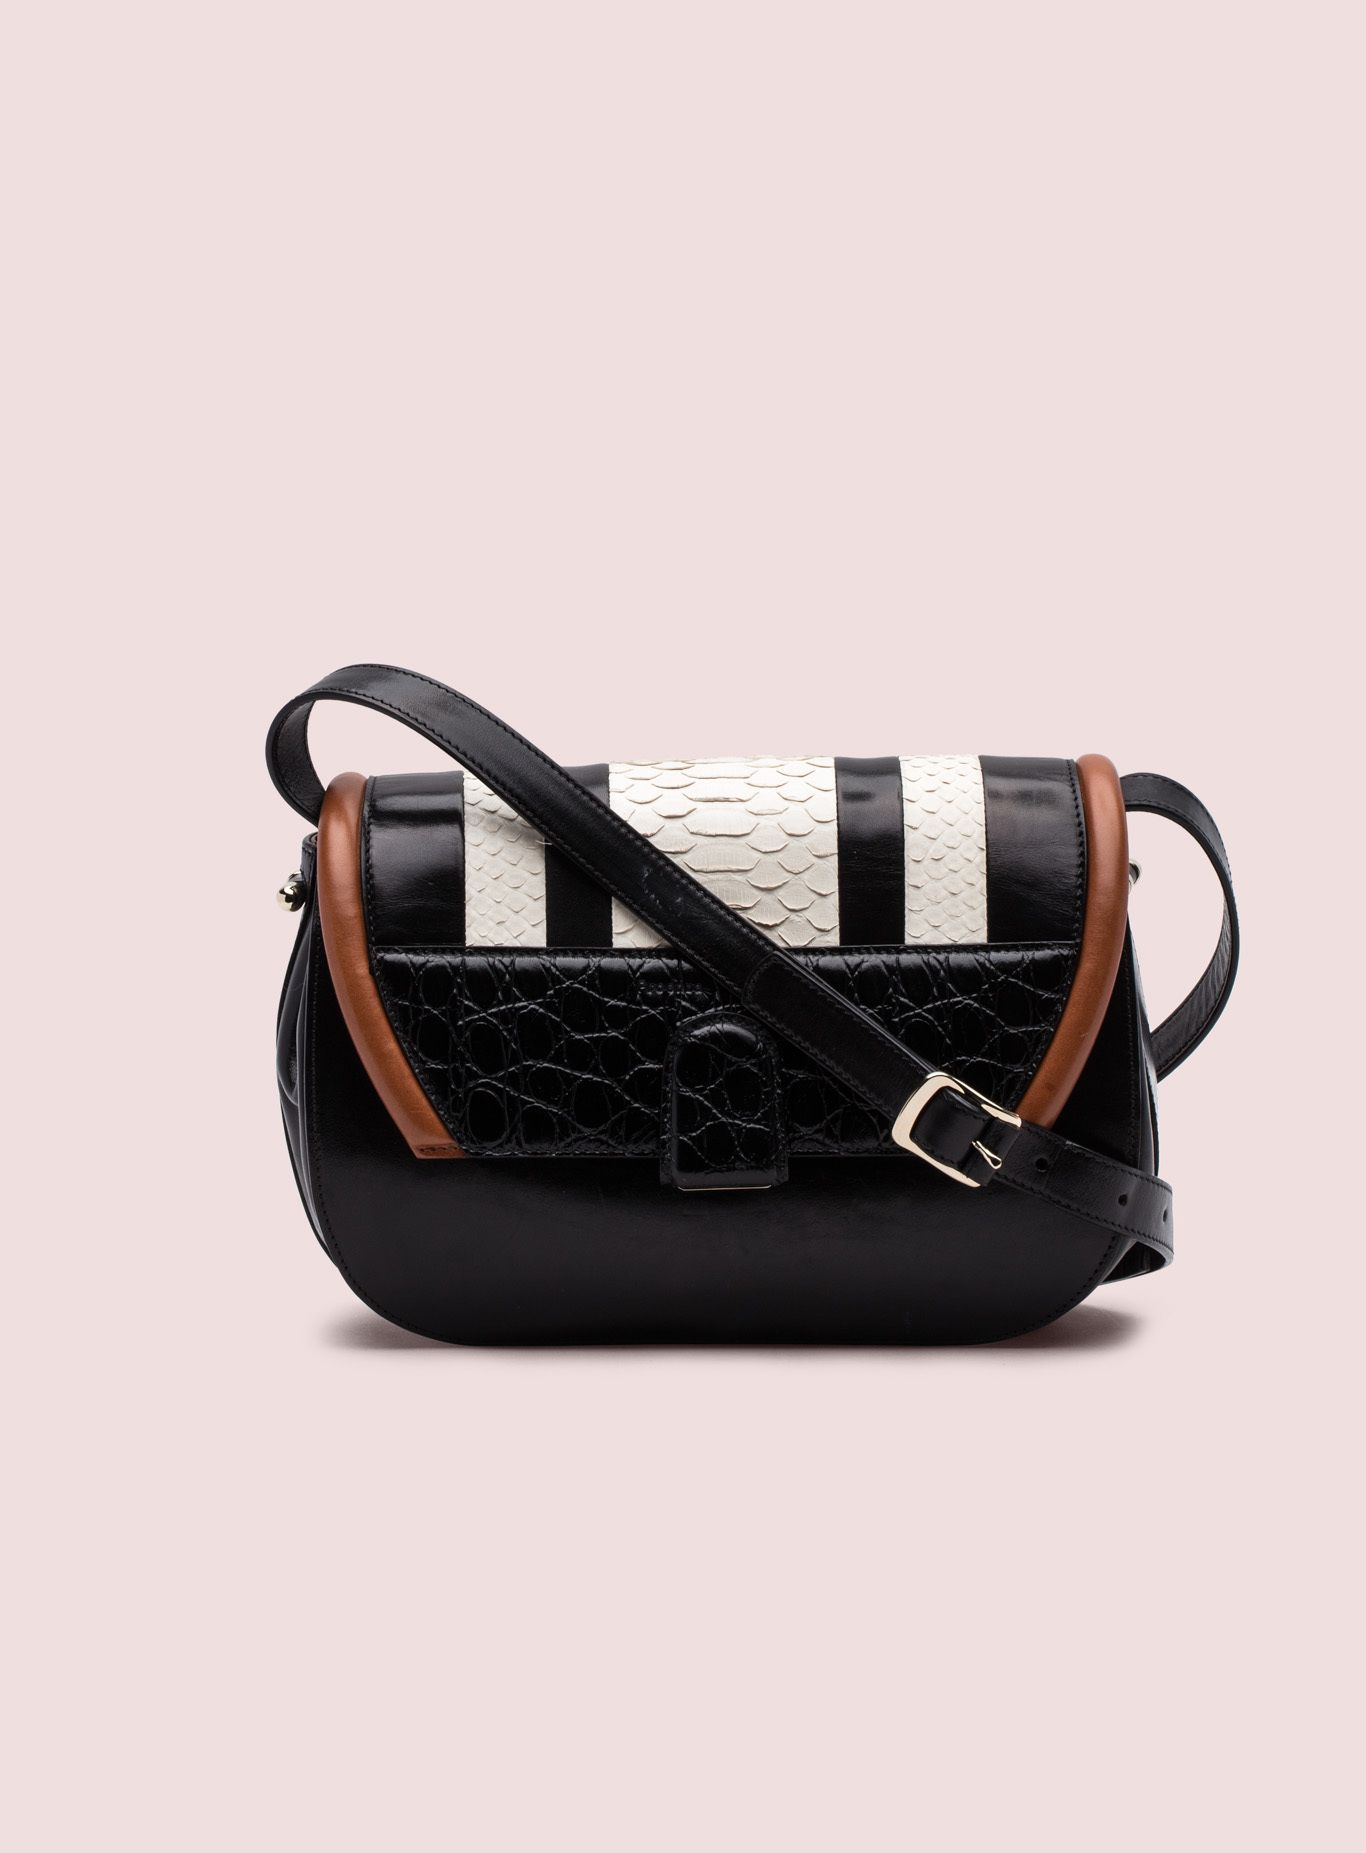 Proenza Schouler U Bag